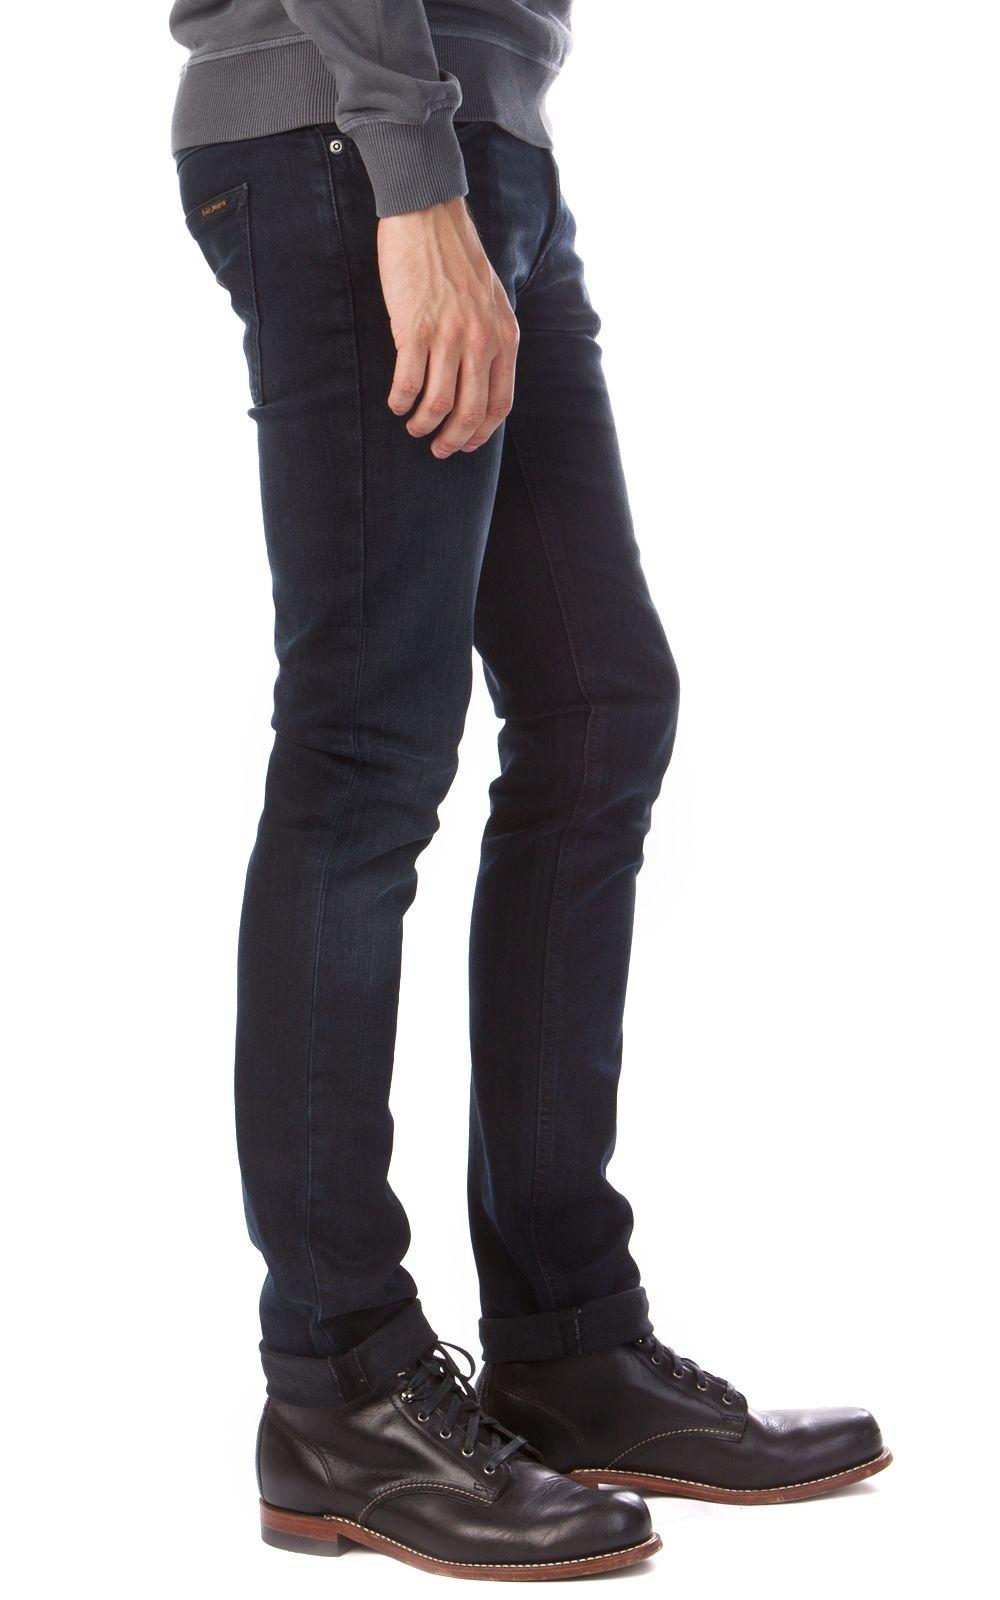 79761af7b5 Cultizm.com - Thin Finn Organic Black Ring 11 Months Nudie Jeans Thin Finn  Organic Black Ring 11 Months 111638